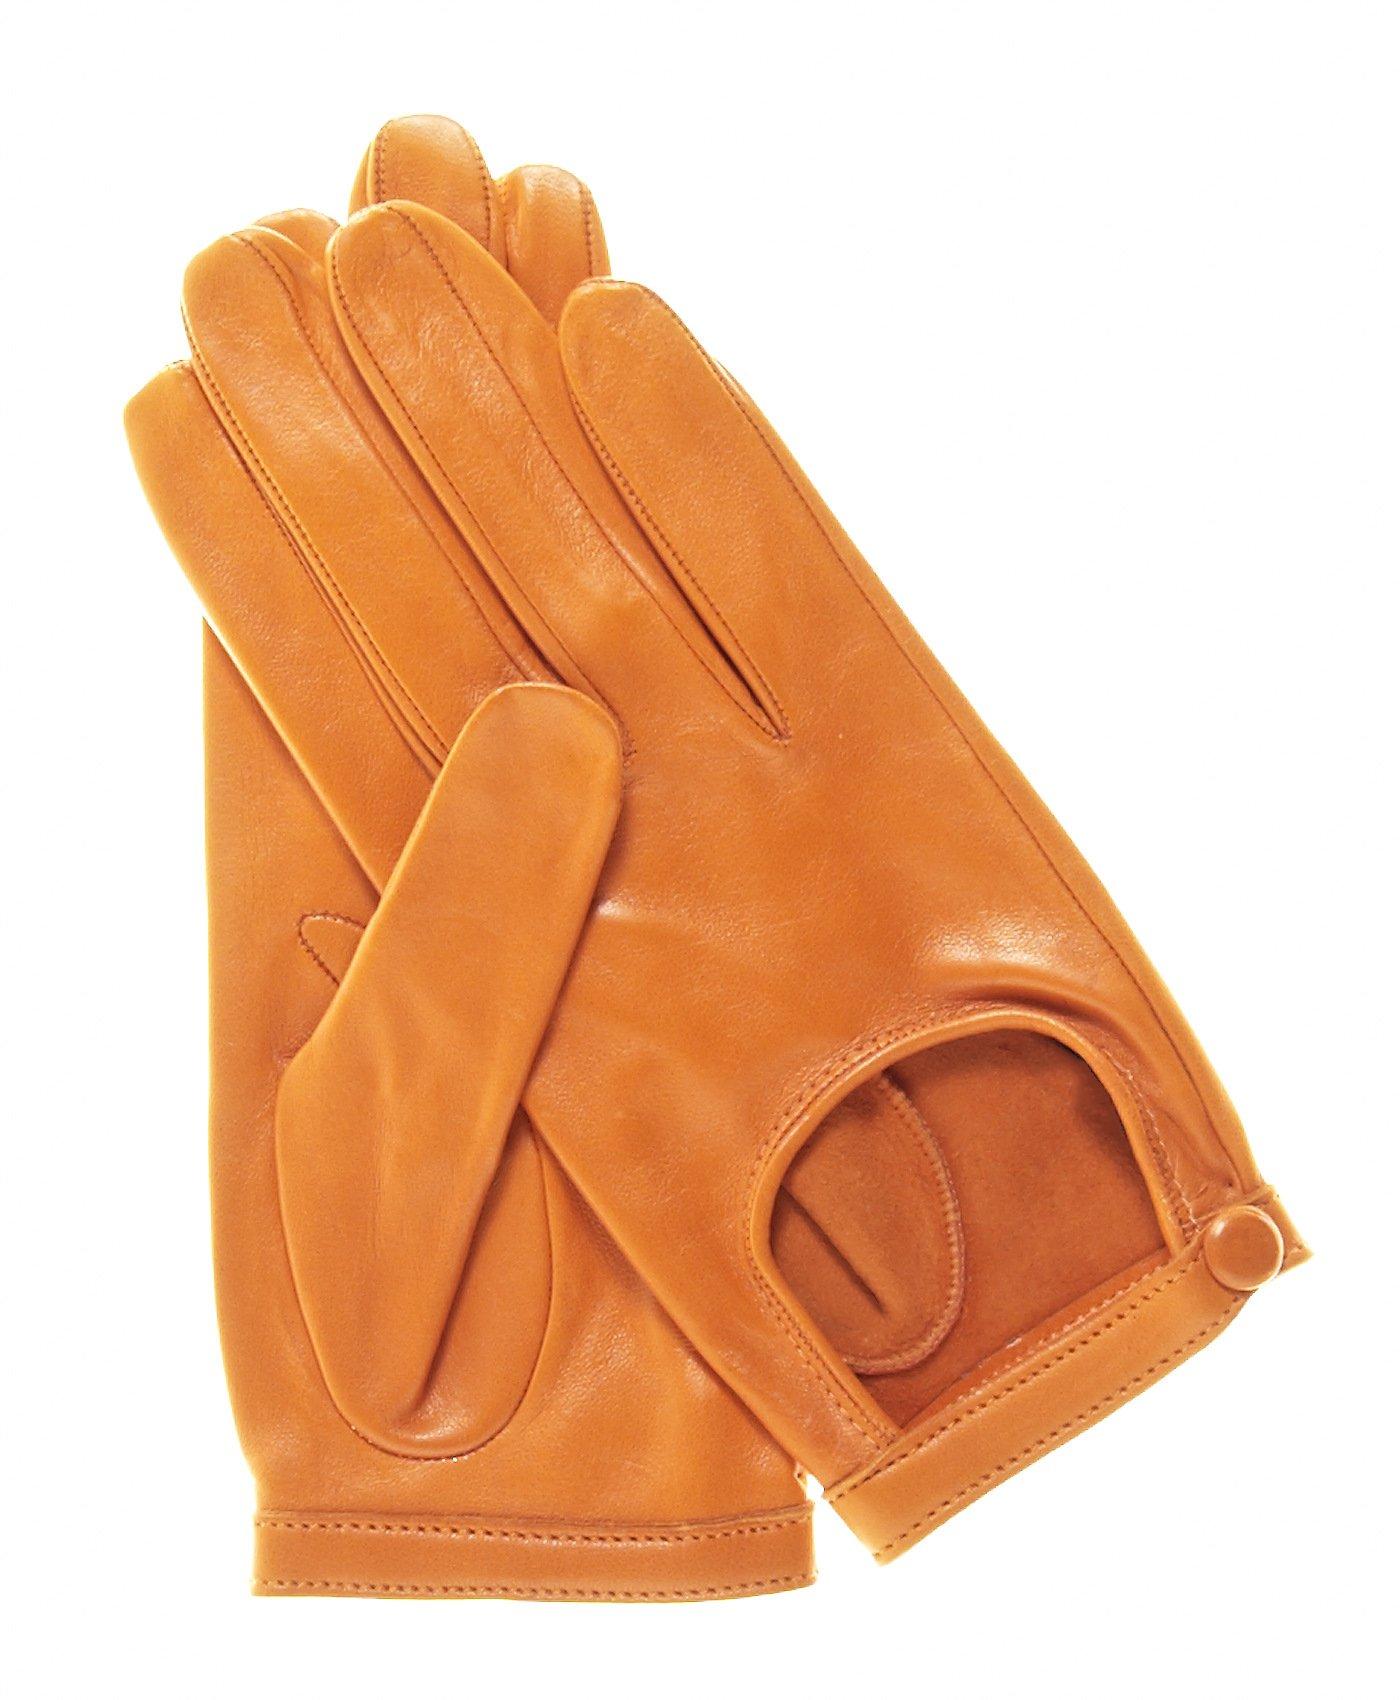 Fratelli Orsini Women's Classico Italian Lambskin Driving Gloves Size 7 Color Tangerine by Fratelli Orsini